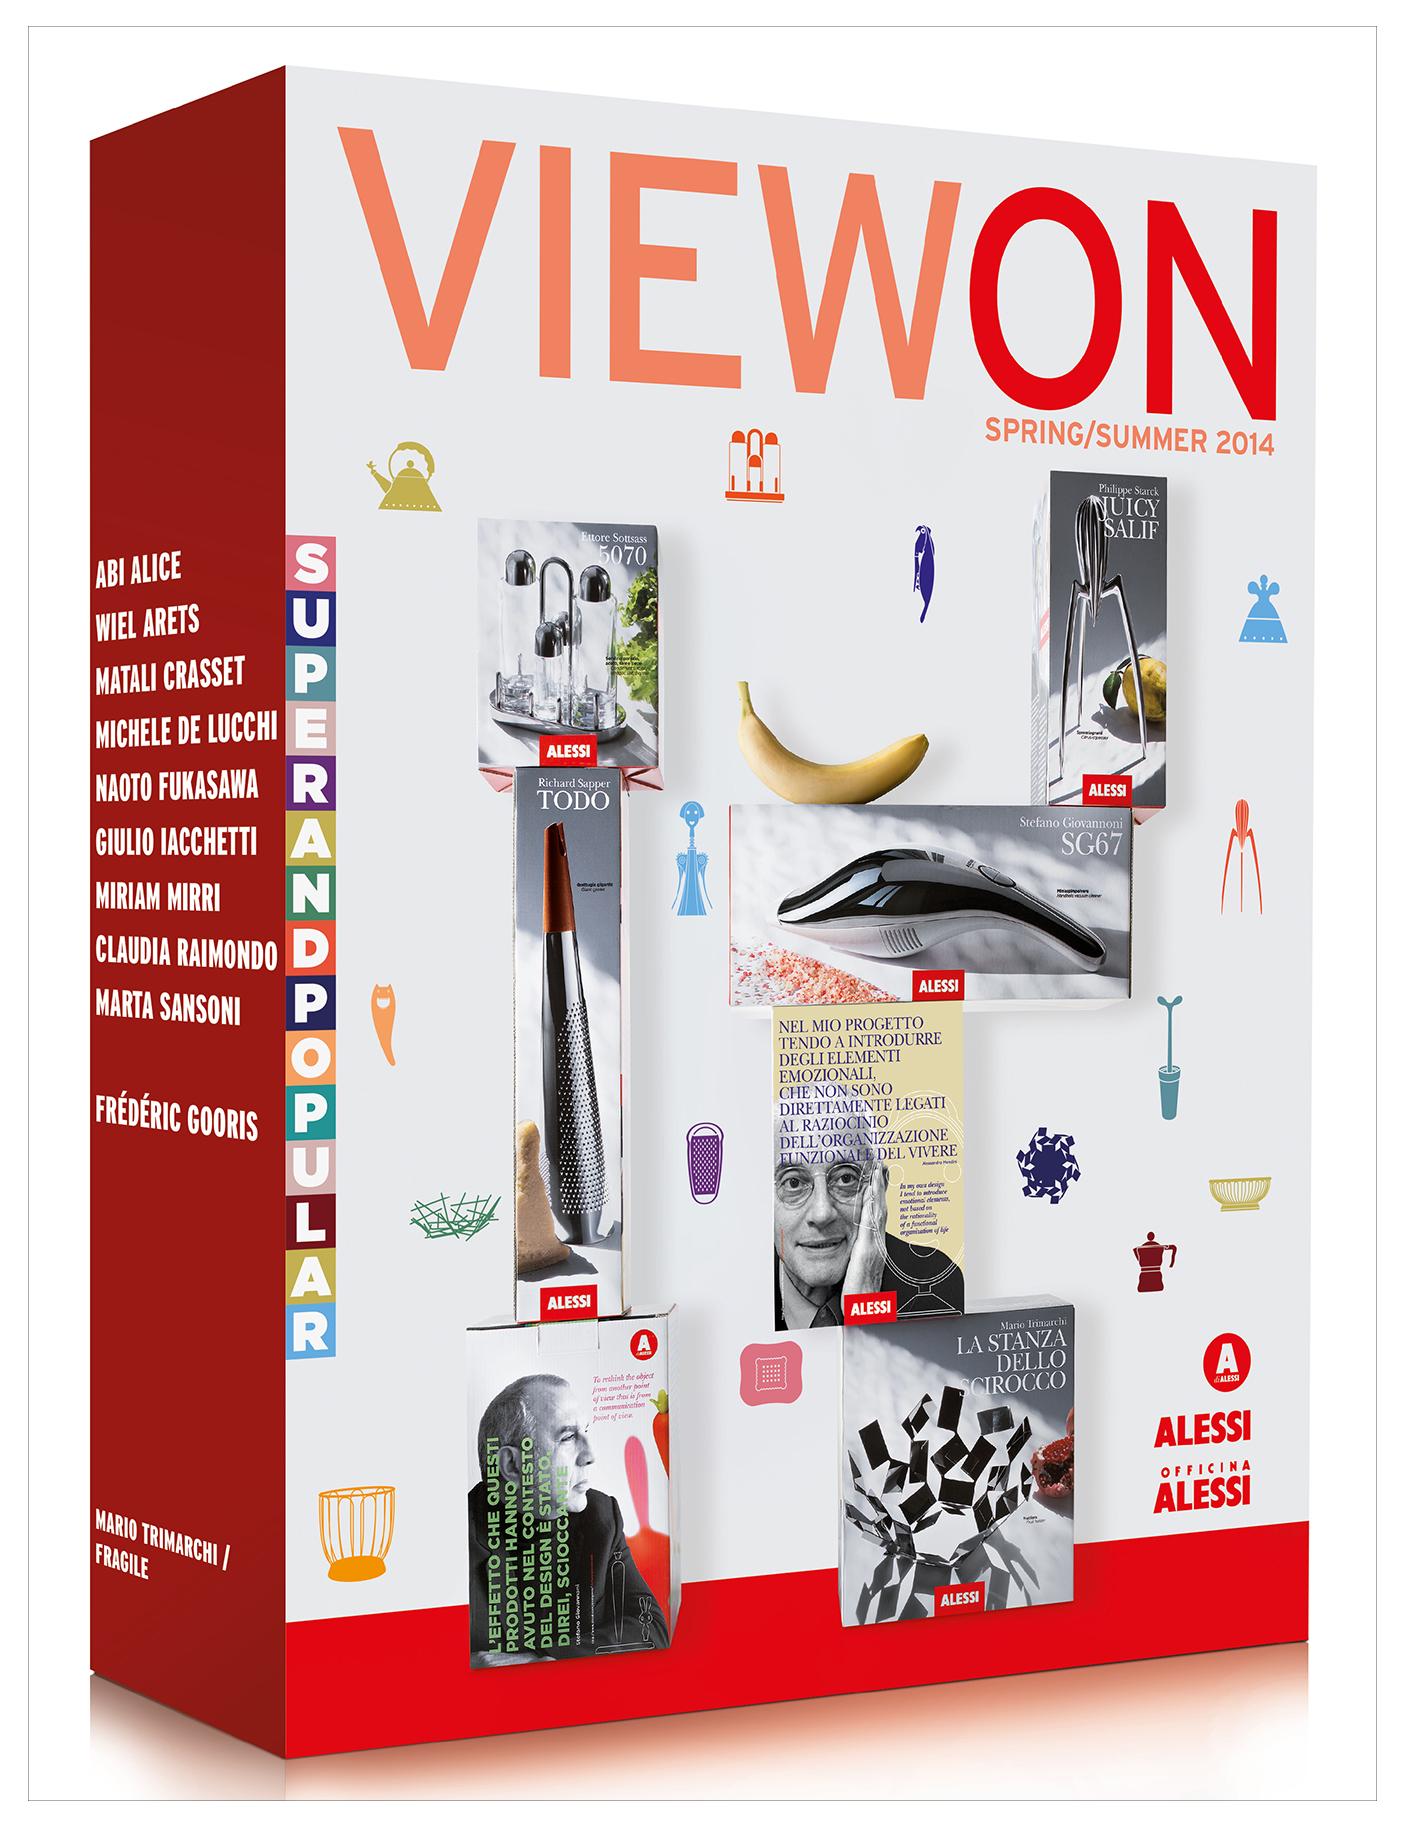 013-ViewOn_SS14 copia.jpg